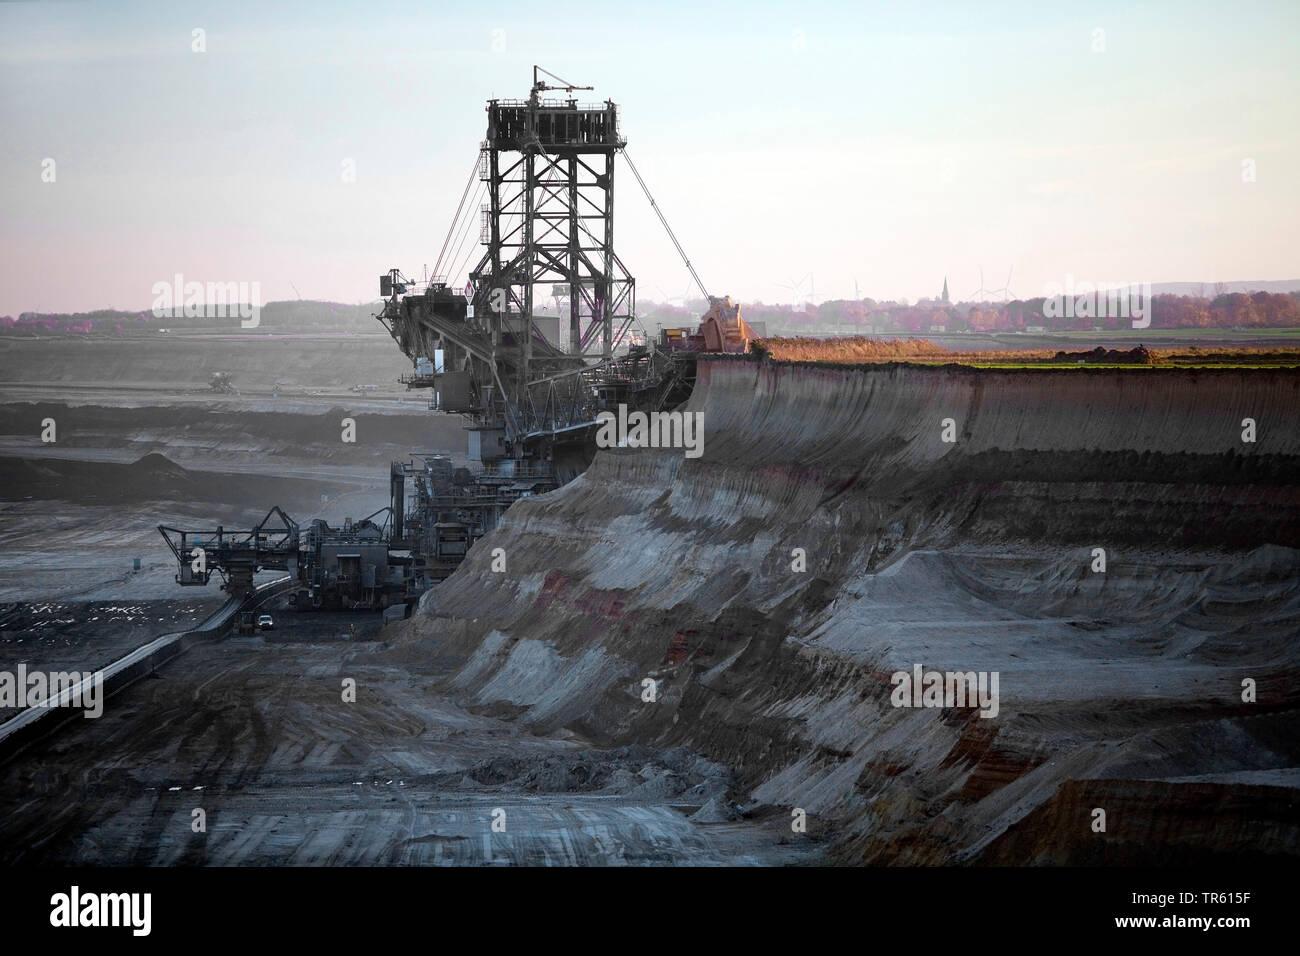 brown coal surface mining with bucket wheel excavator, Germany, North Rhine-Westphalia, Garzweiler, Juechen Stock Photo